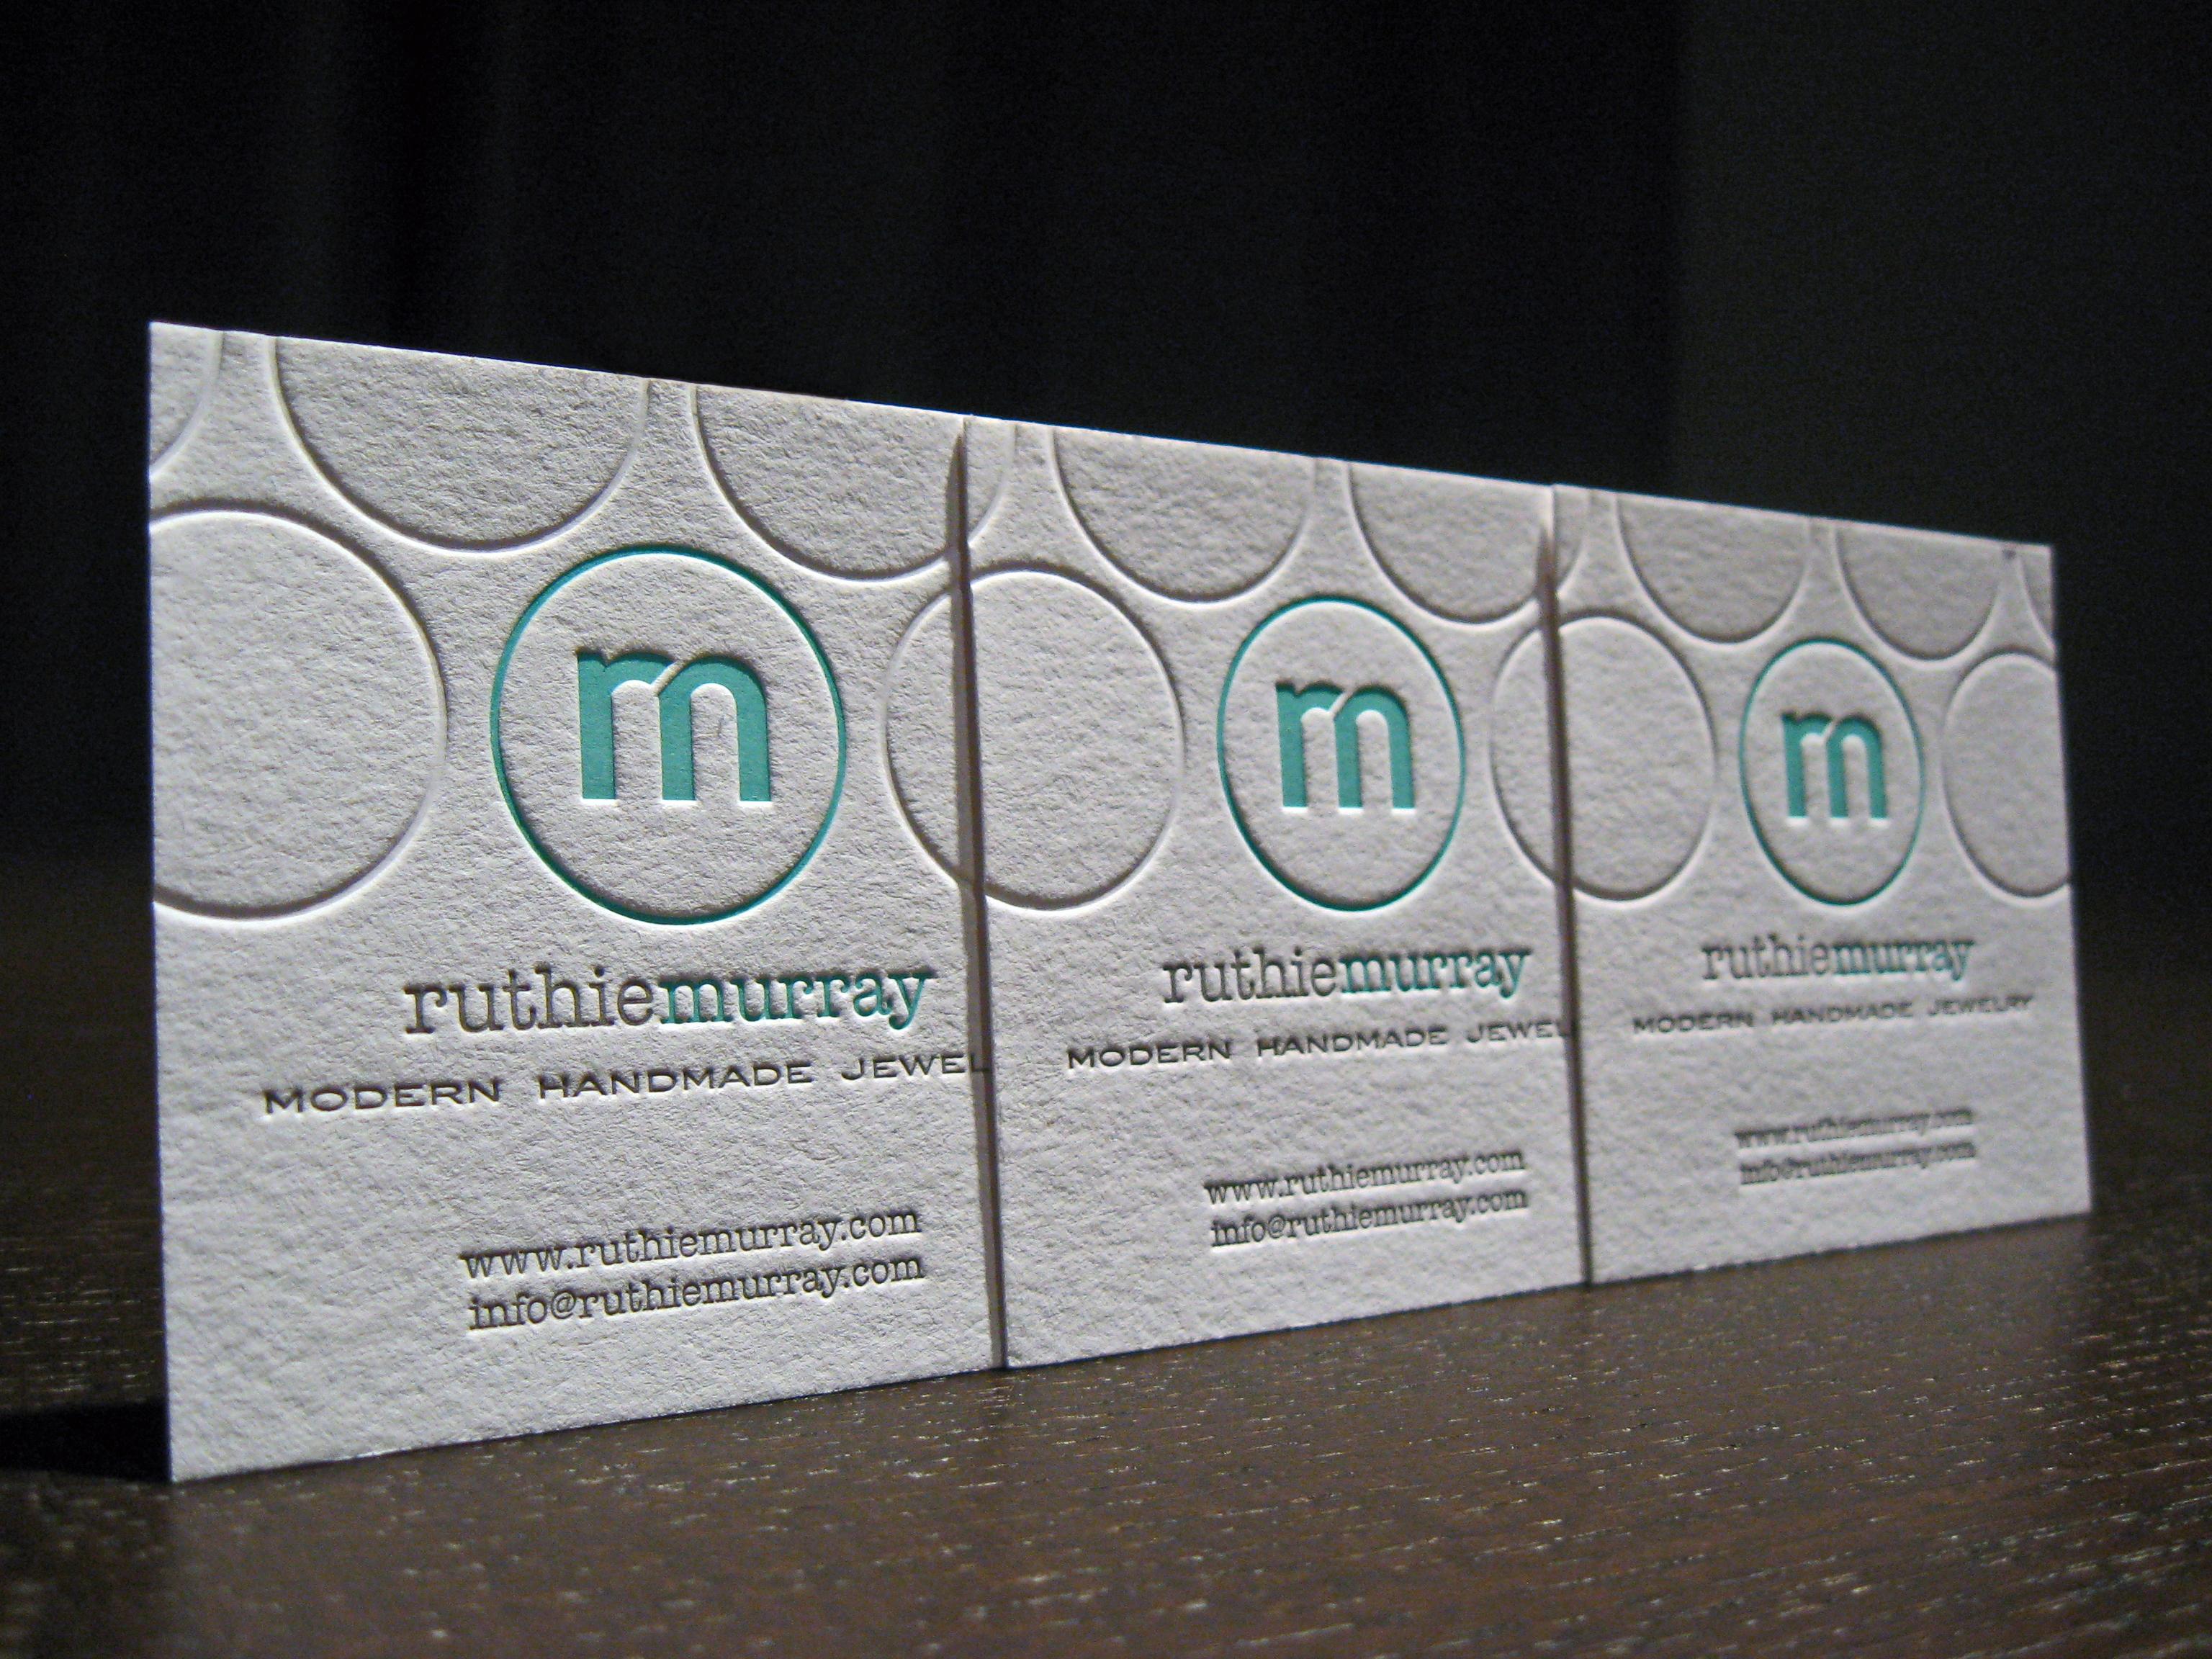 Modern handmade jewelry business card 4 flickr photo for Handmade jewelry business cards